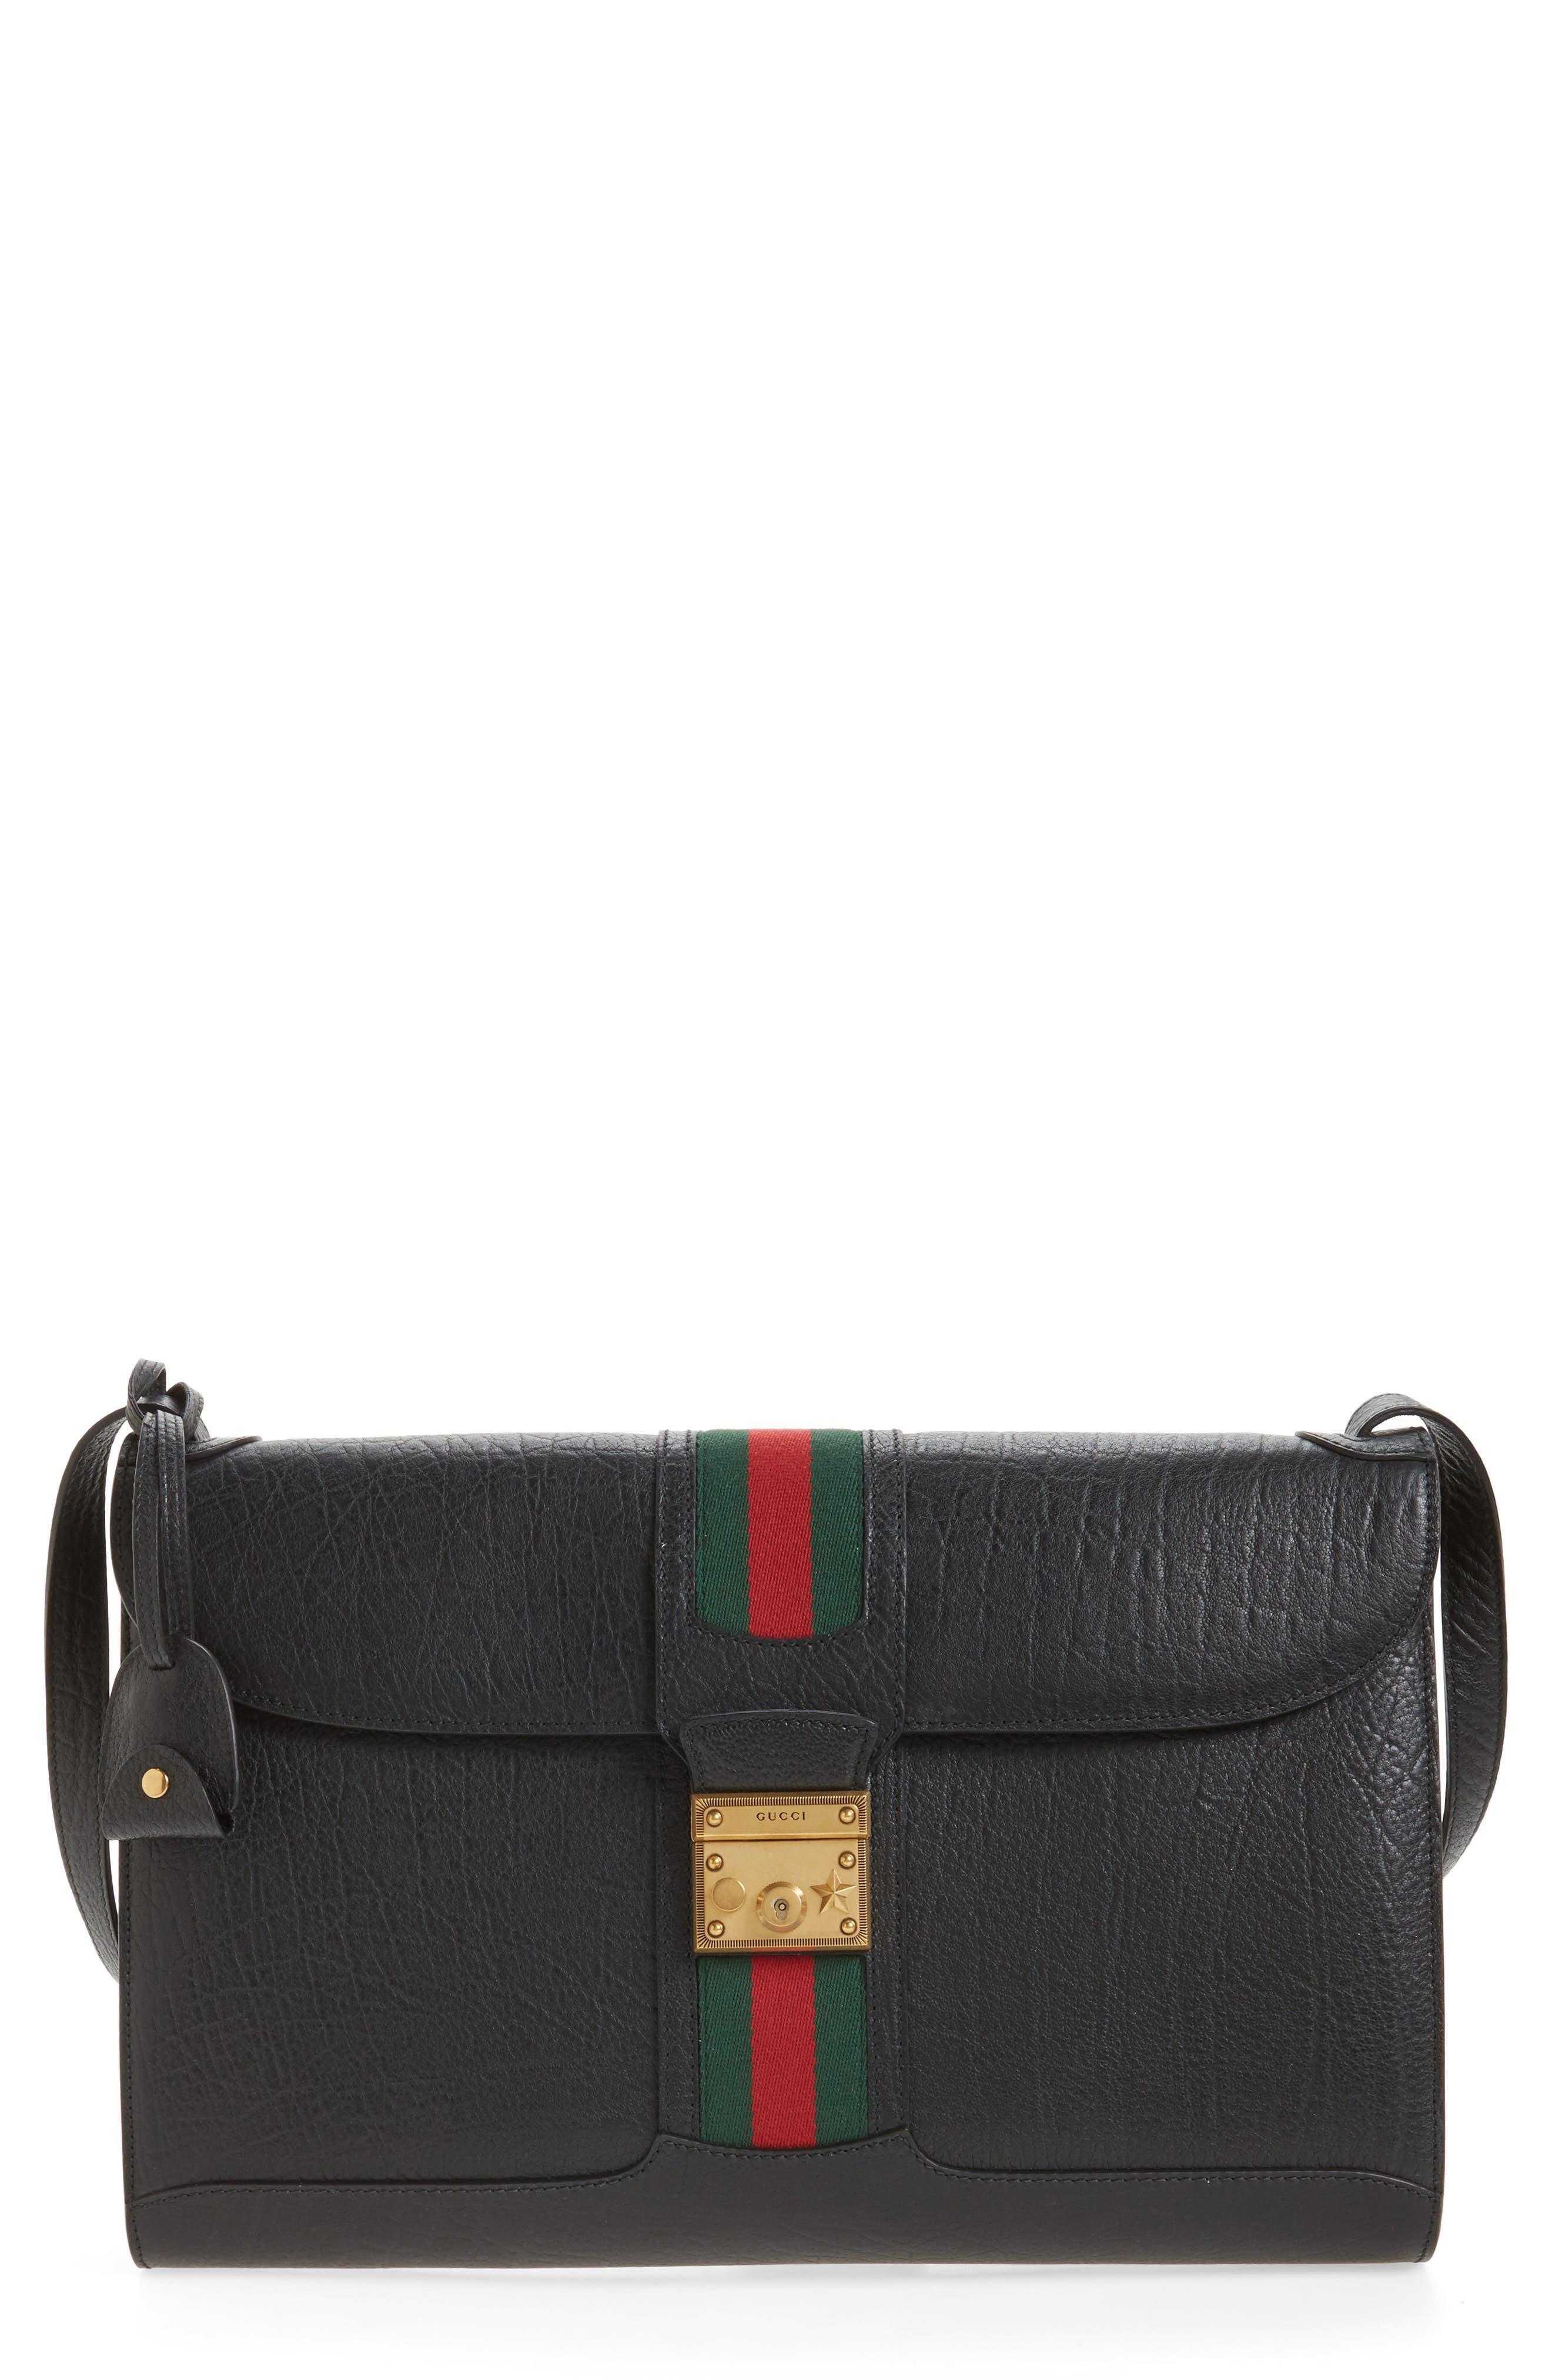 Neo Vintage Messenger Bag,                             Main thumbnail 1, color,                             Black Multi